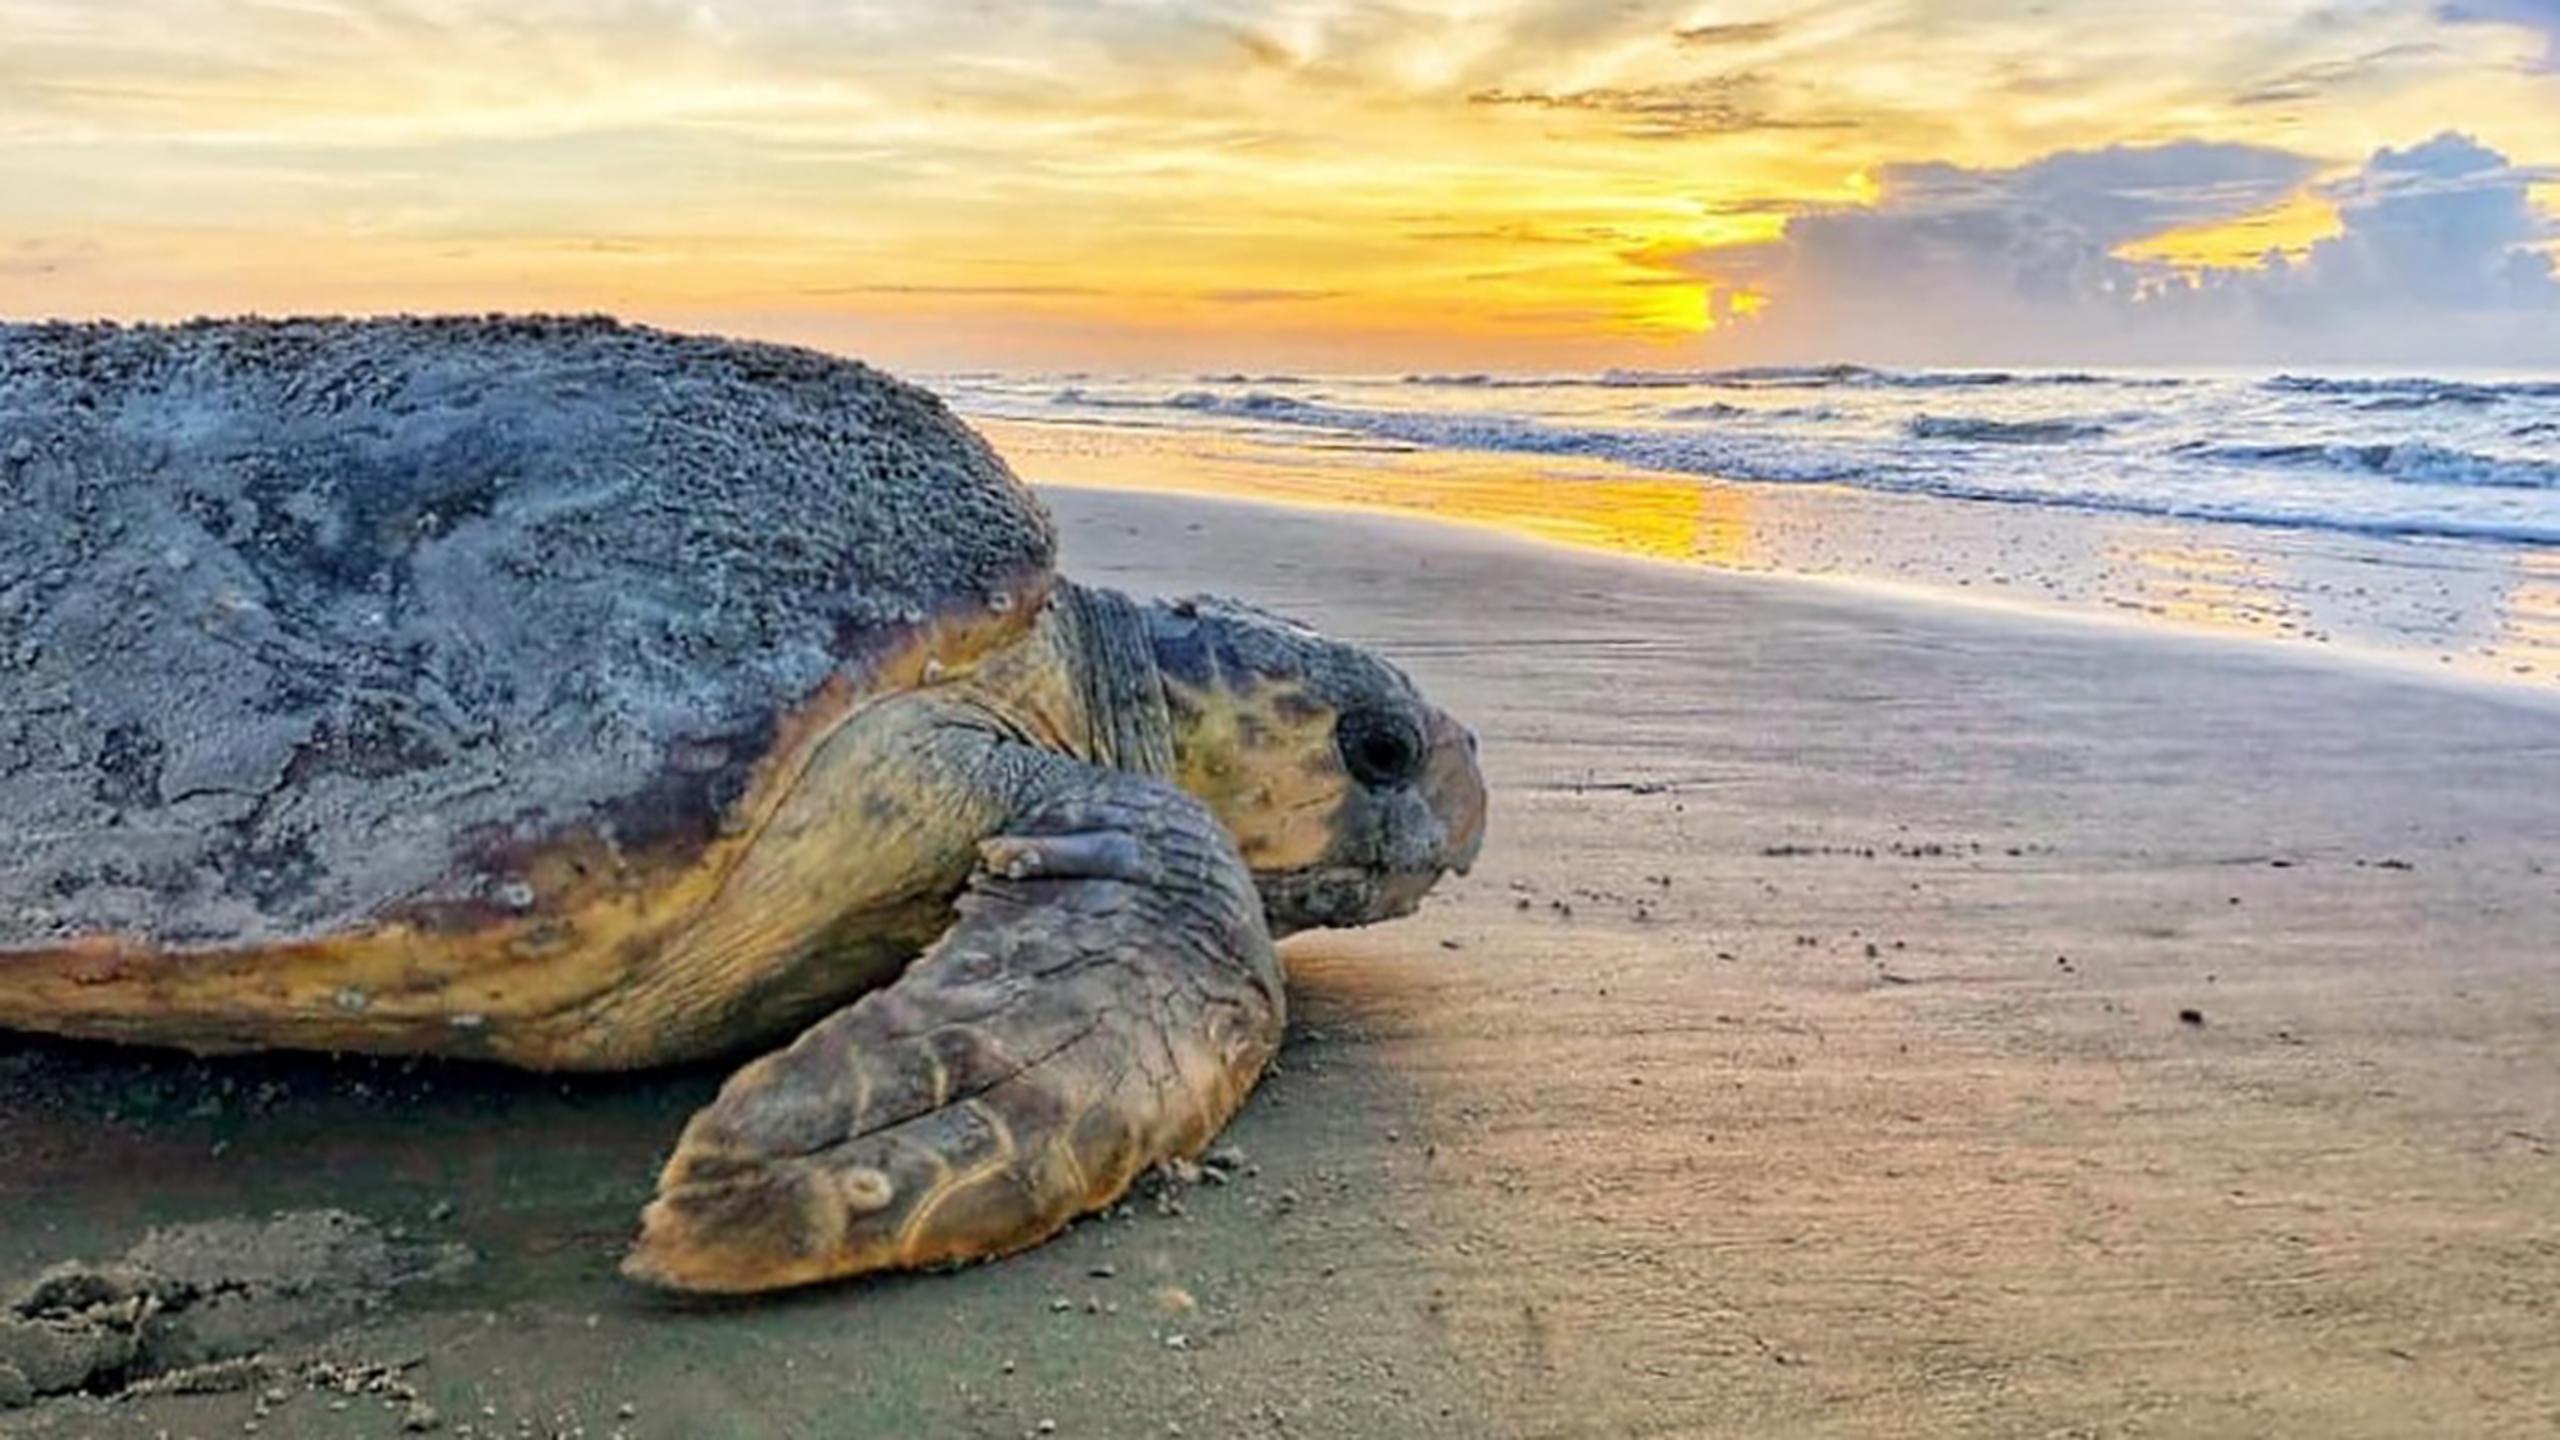 Rare sea turtles smash nesting records in southern states